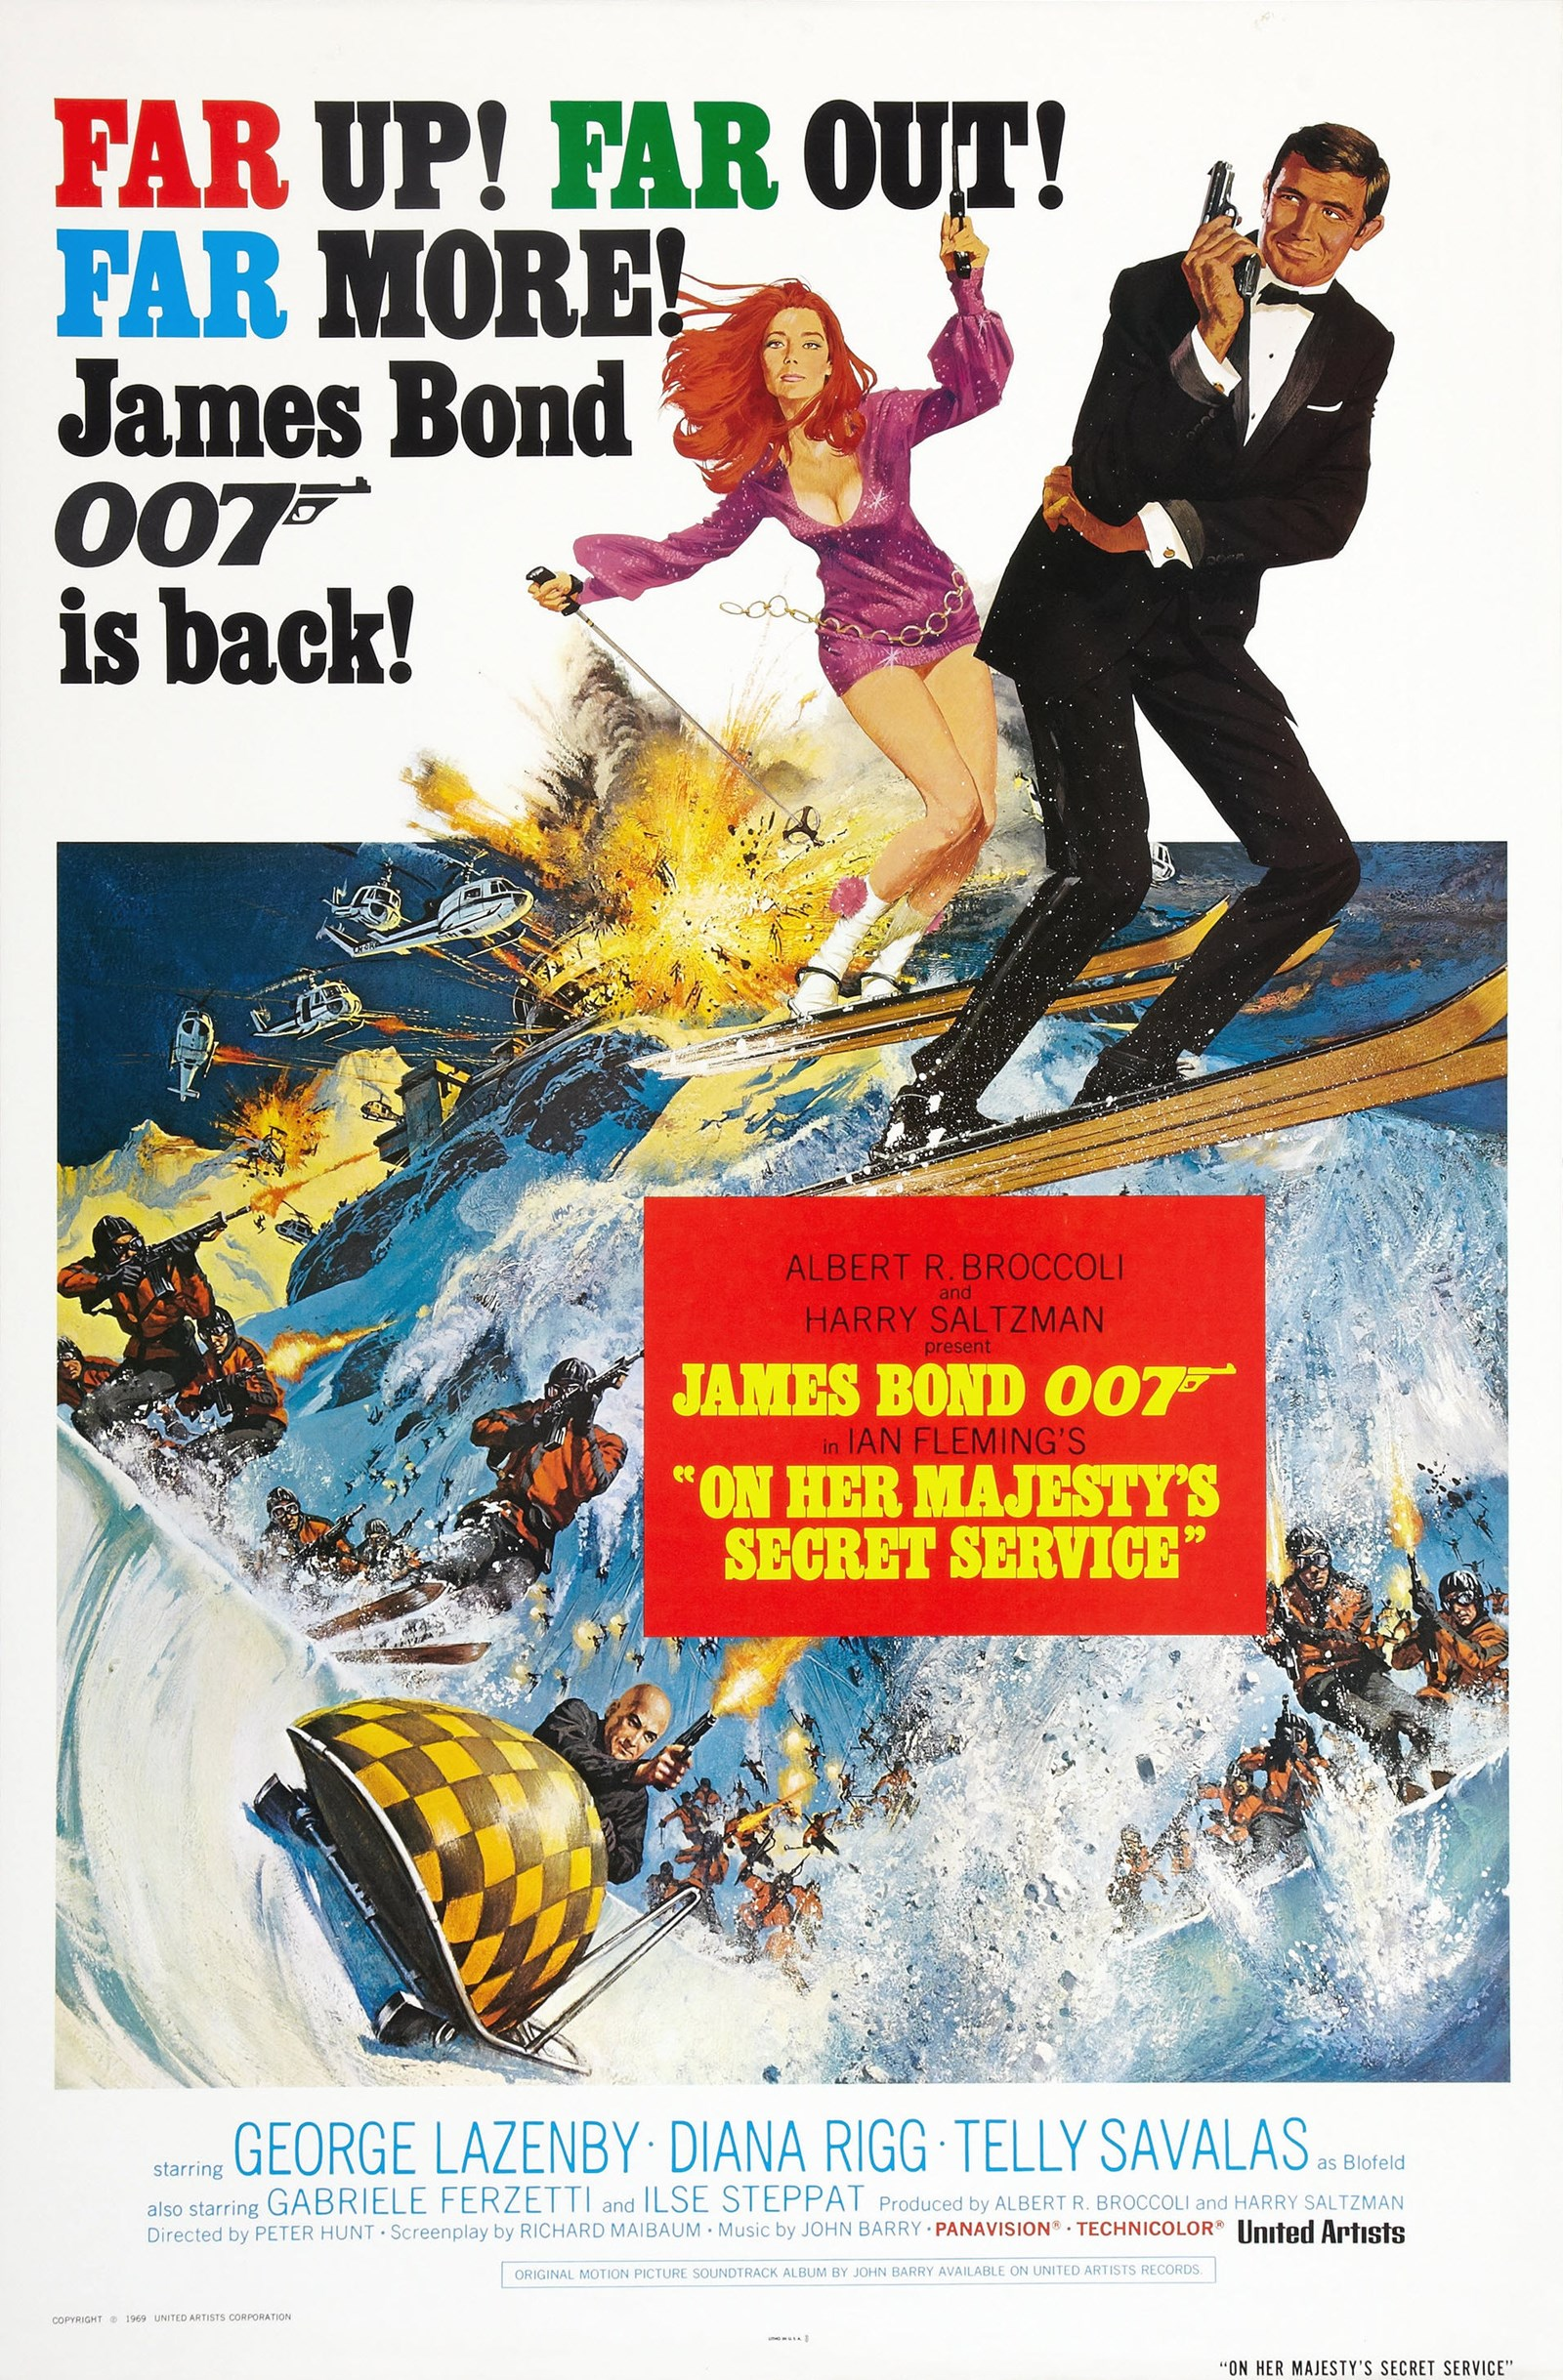 james bond 22 film collection 720p brrip xvid ac3 majestic